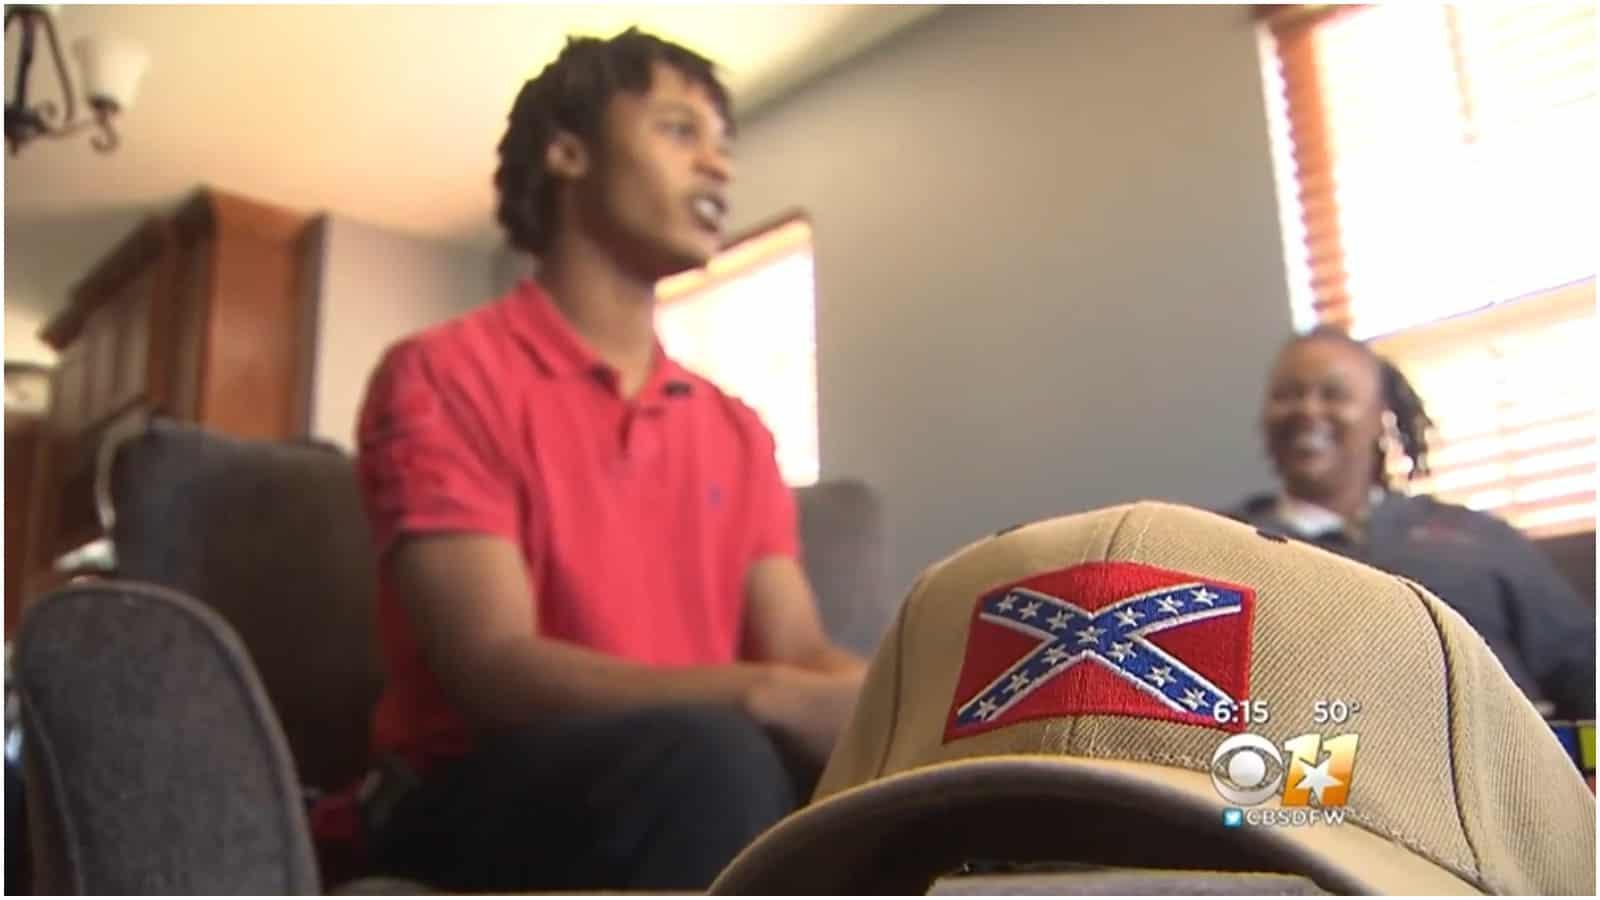 confederate flag, student, autism, Texas